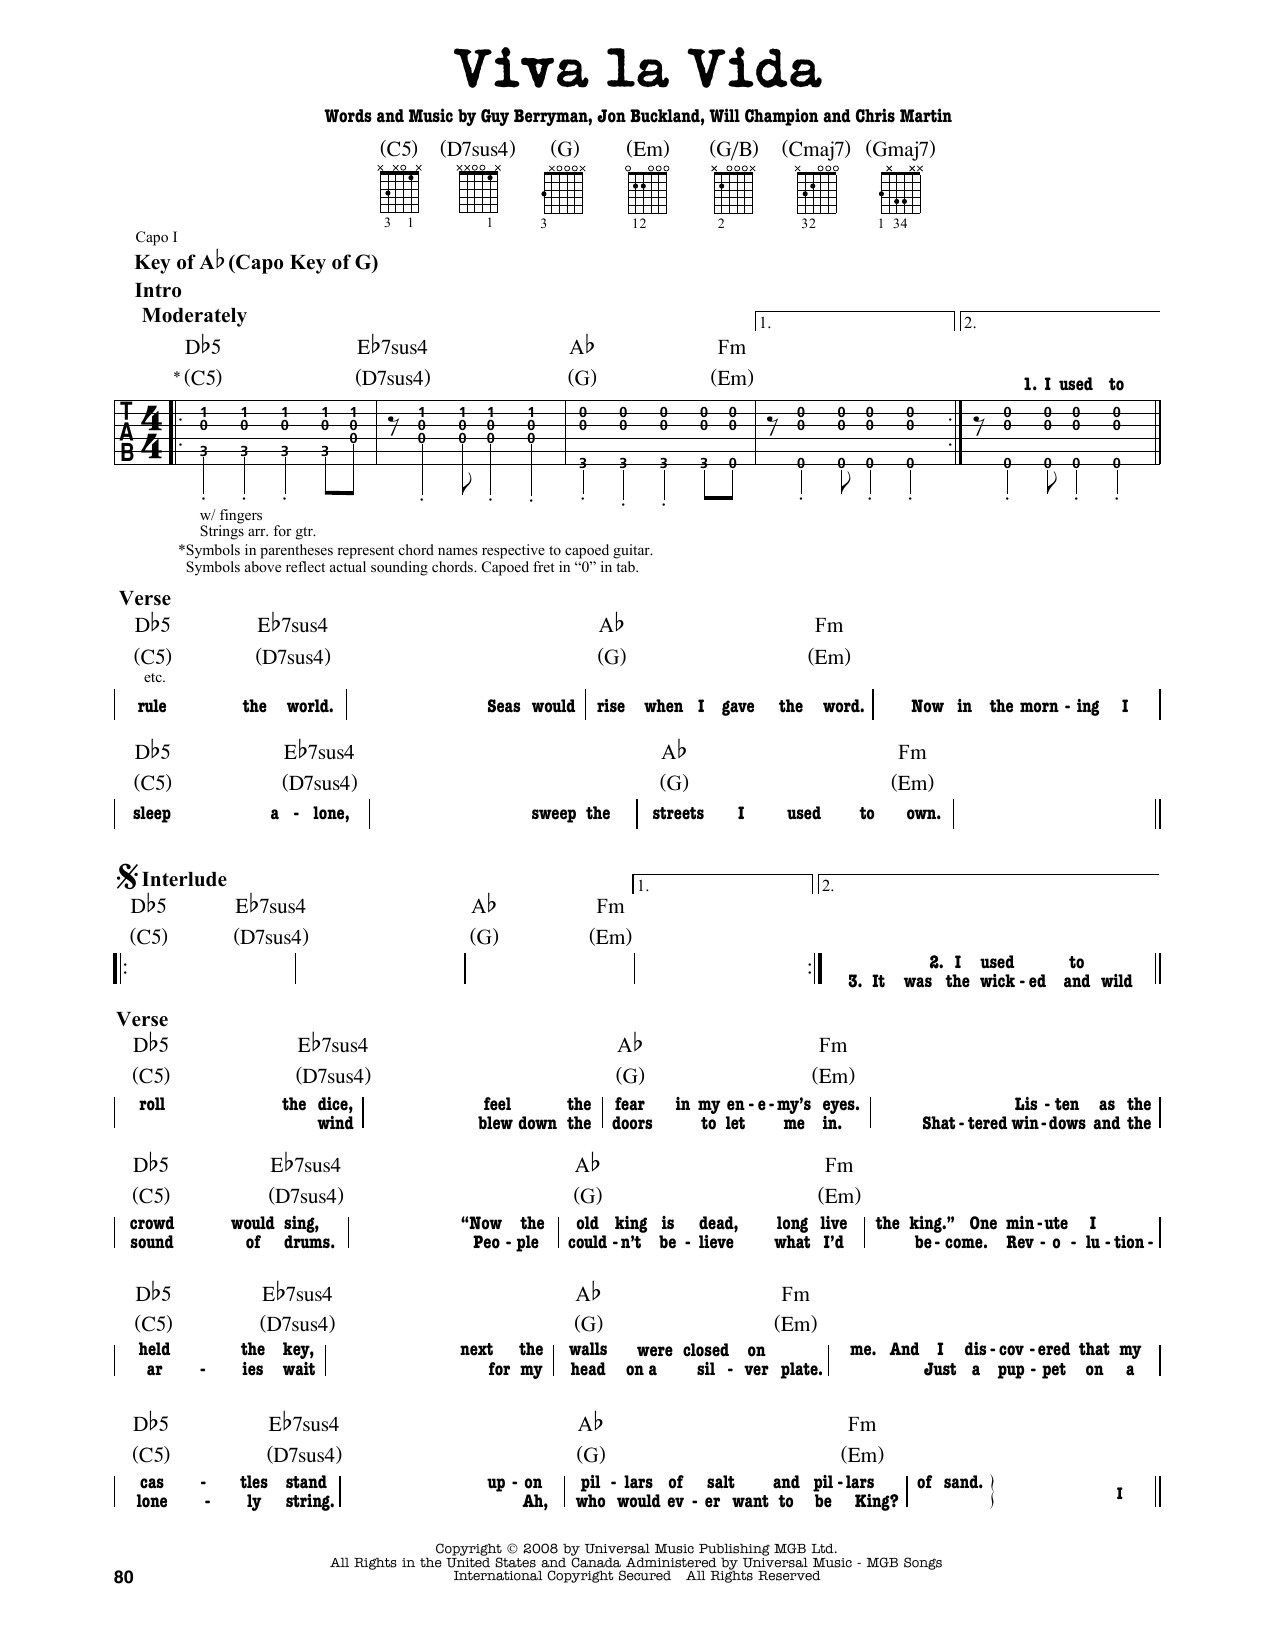 Viva la vida sheet music by coldplay guitar lead sheet 163876 coldplay viva la vida guitar lead sheet hexwebz Choice Image